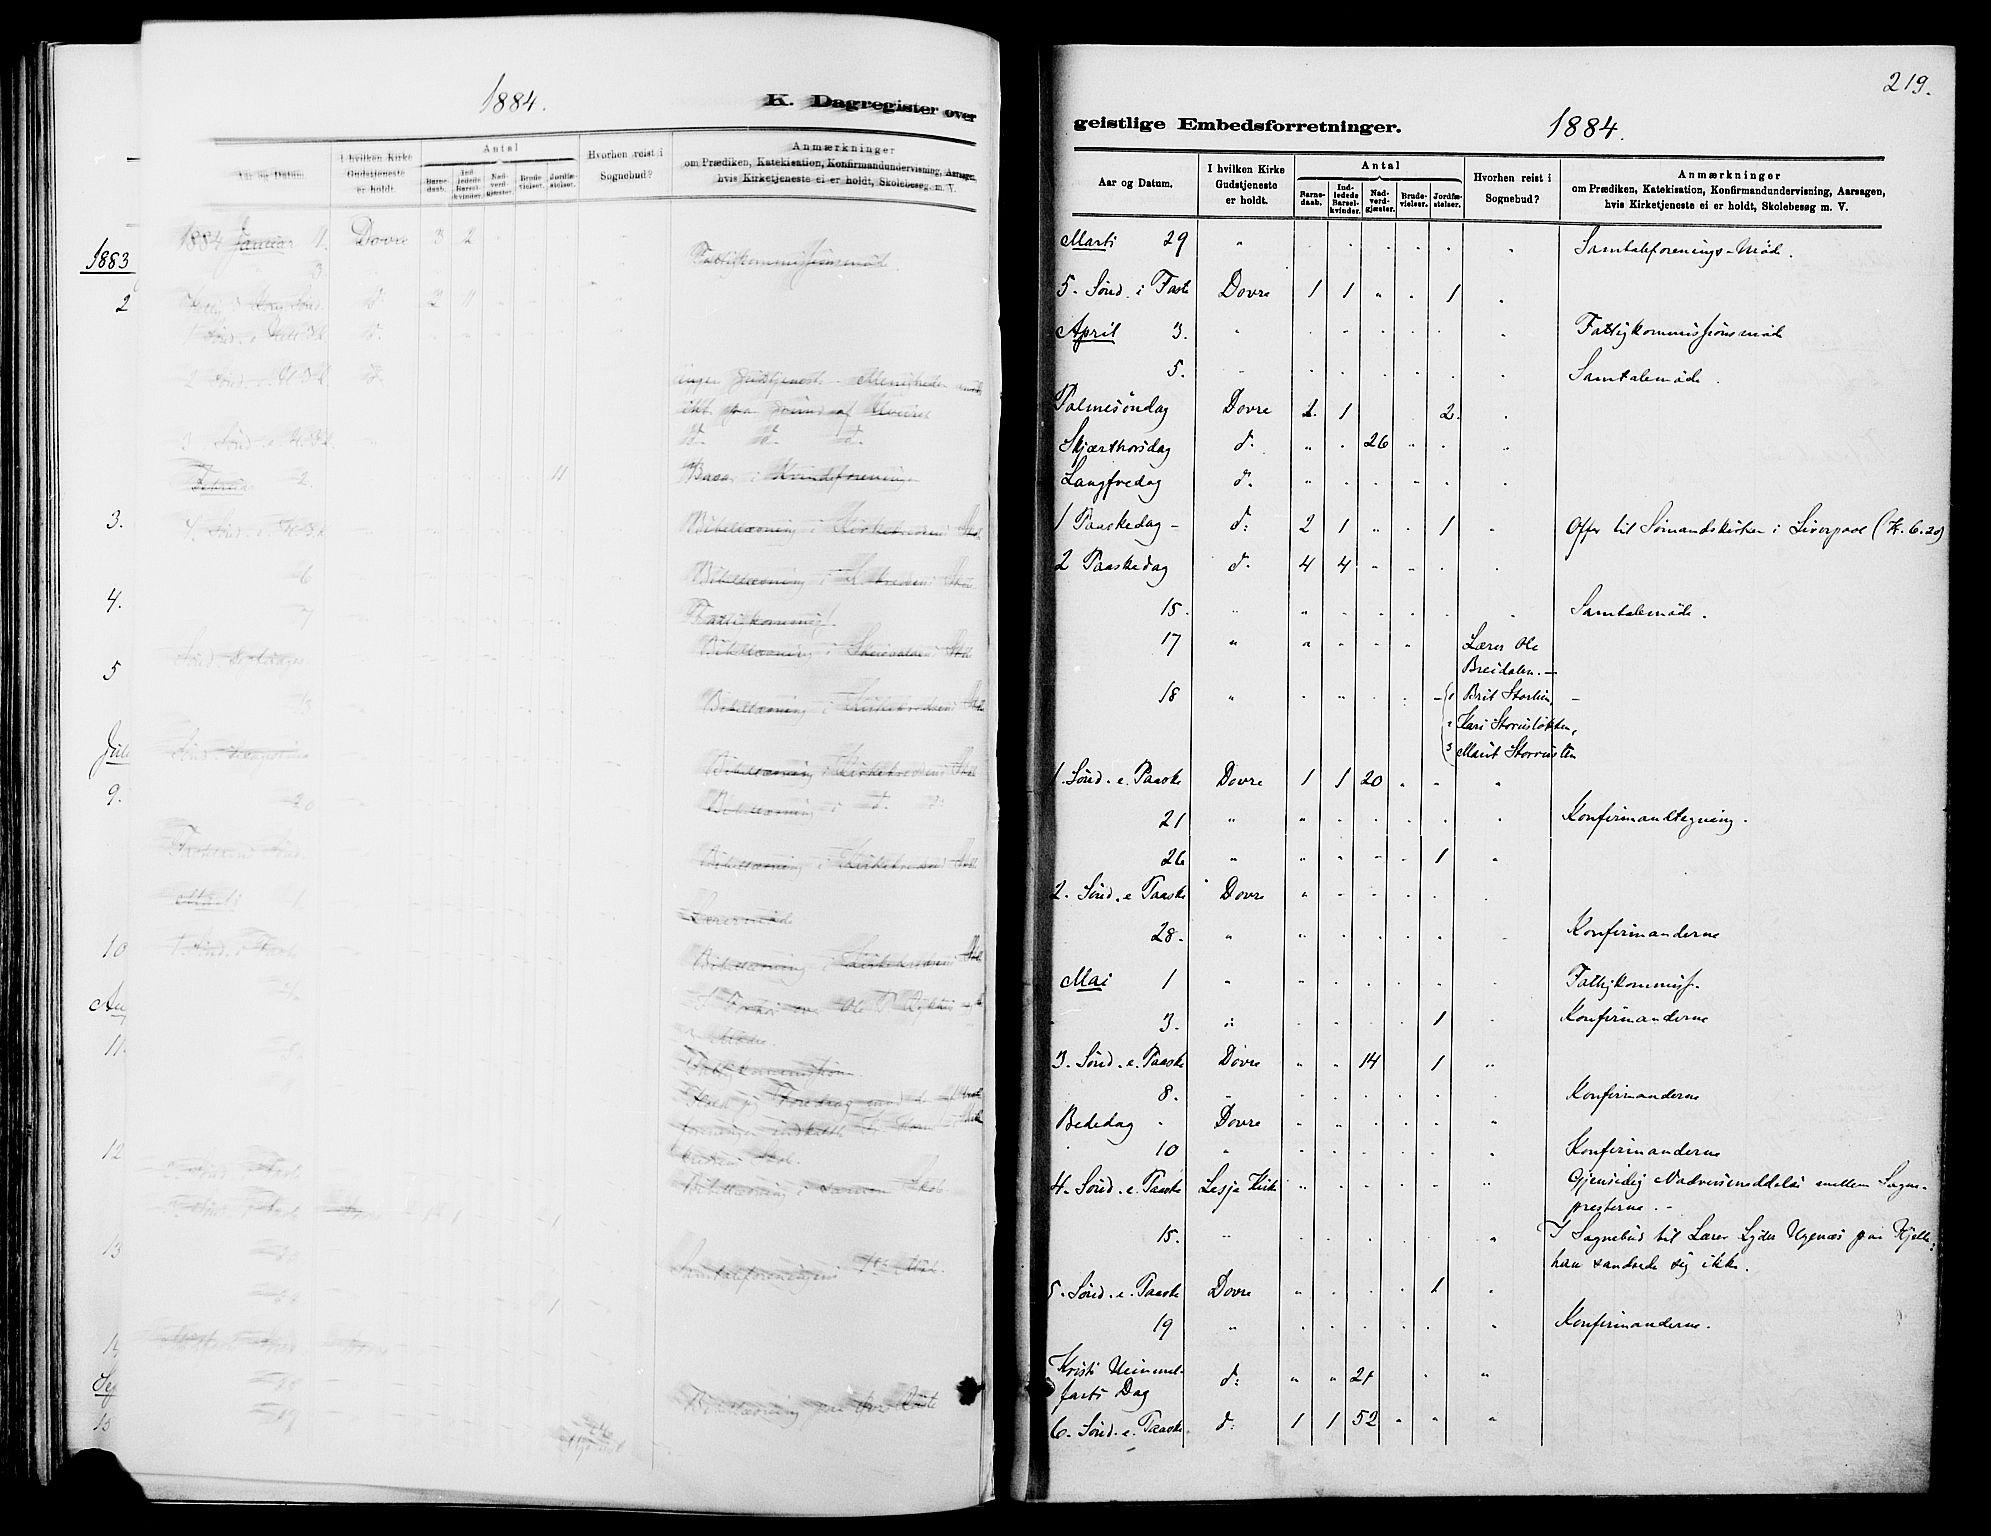 SAH, Dovre prestekontor, Ministerialbok nr. 2, 1879-1890, s. 219